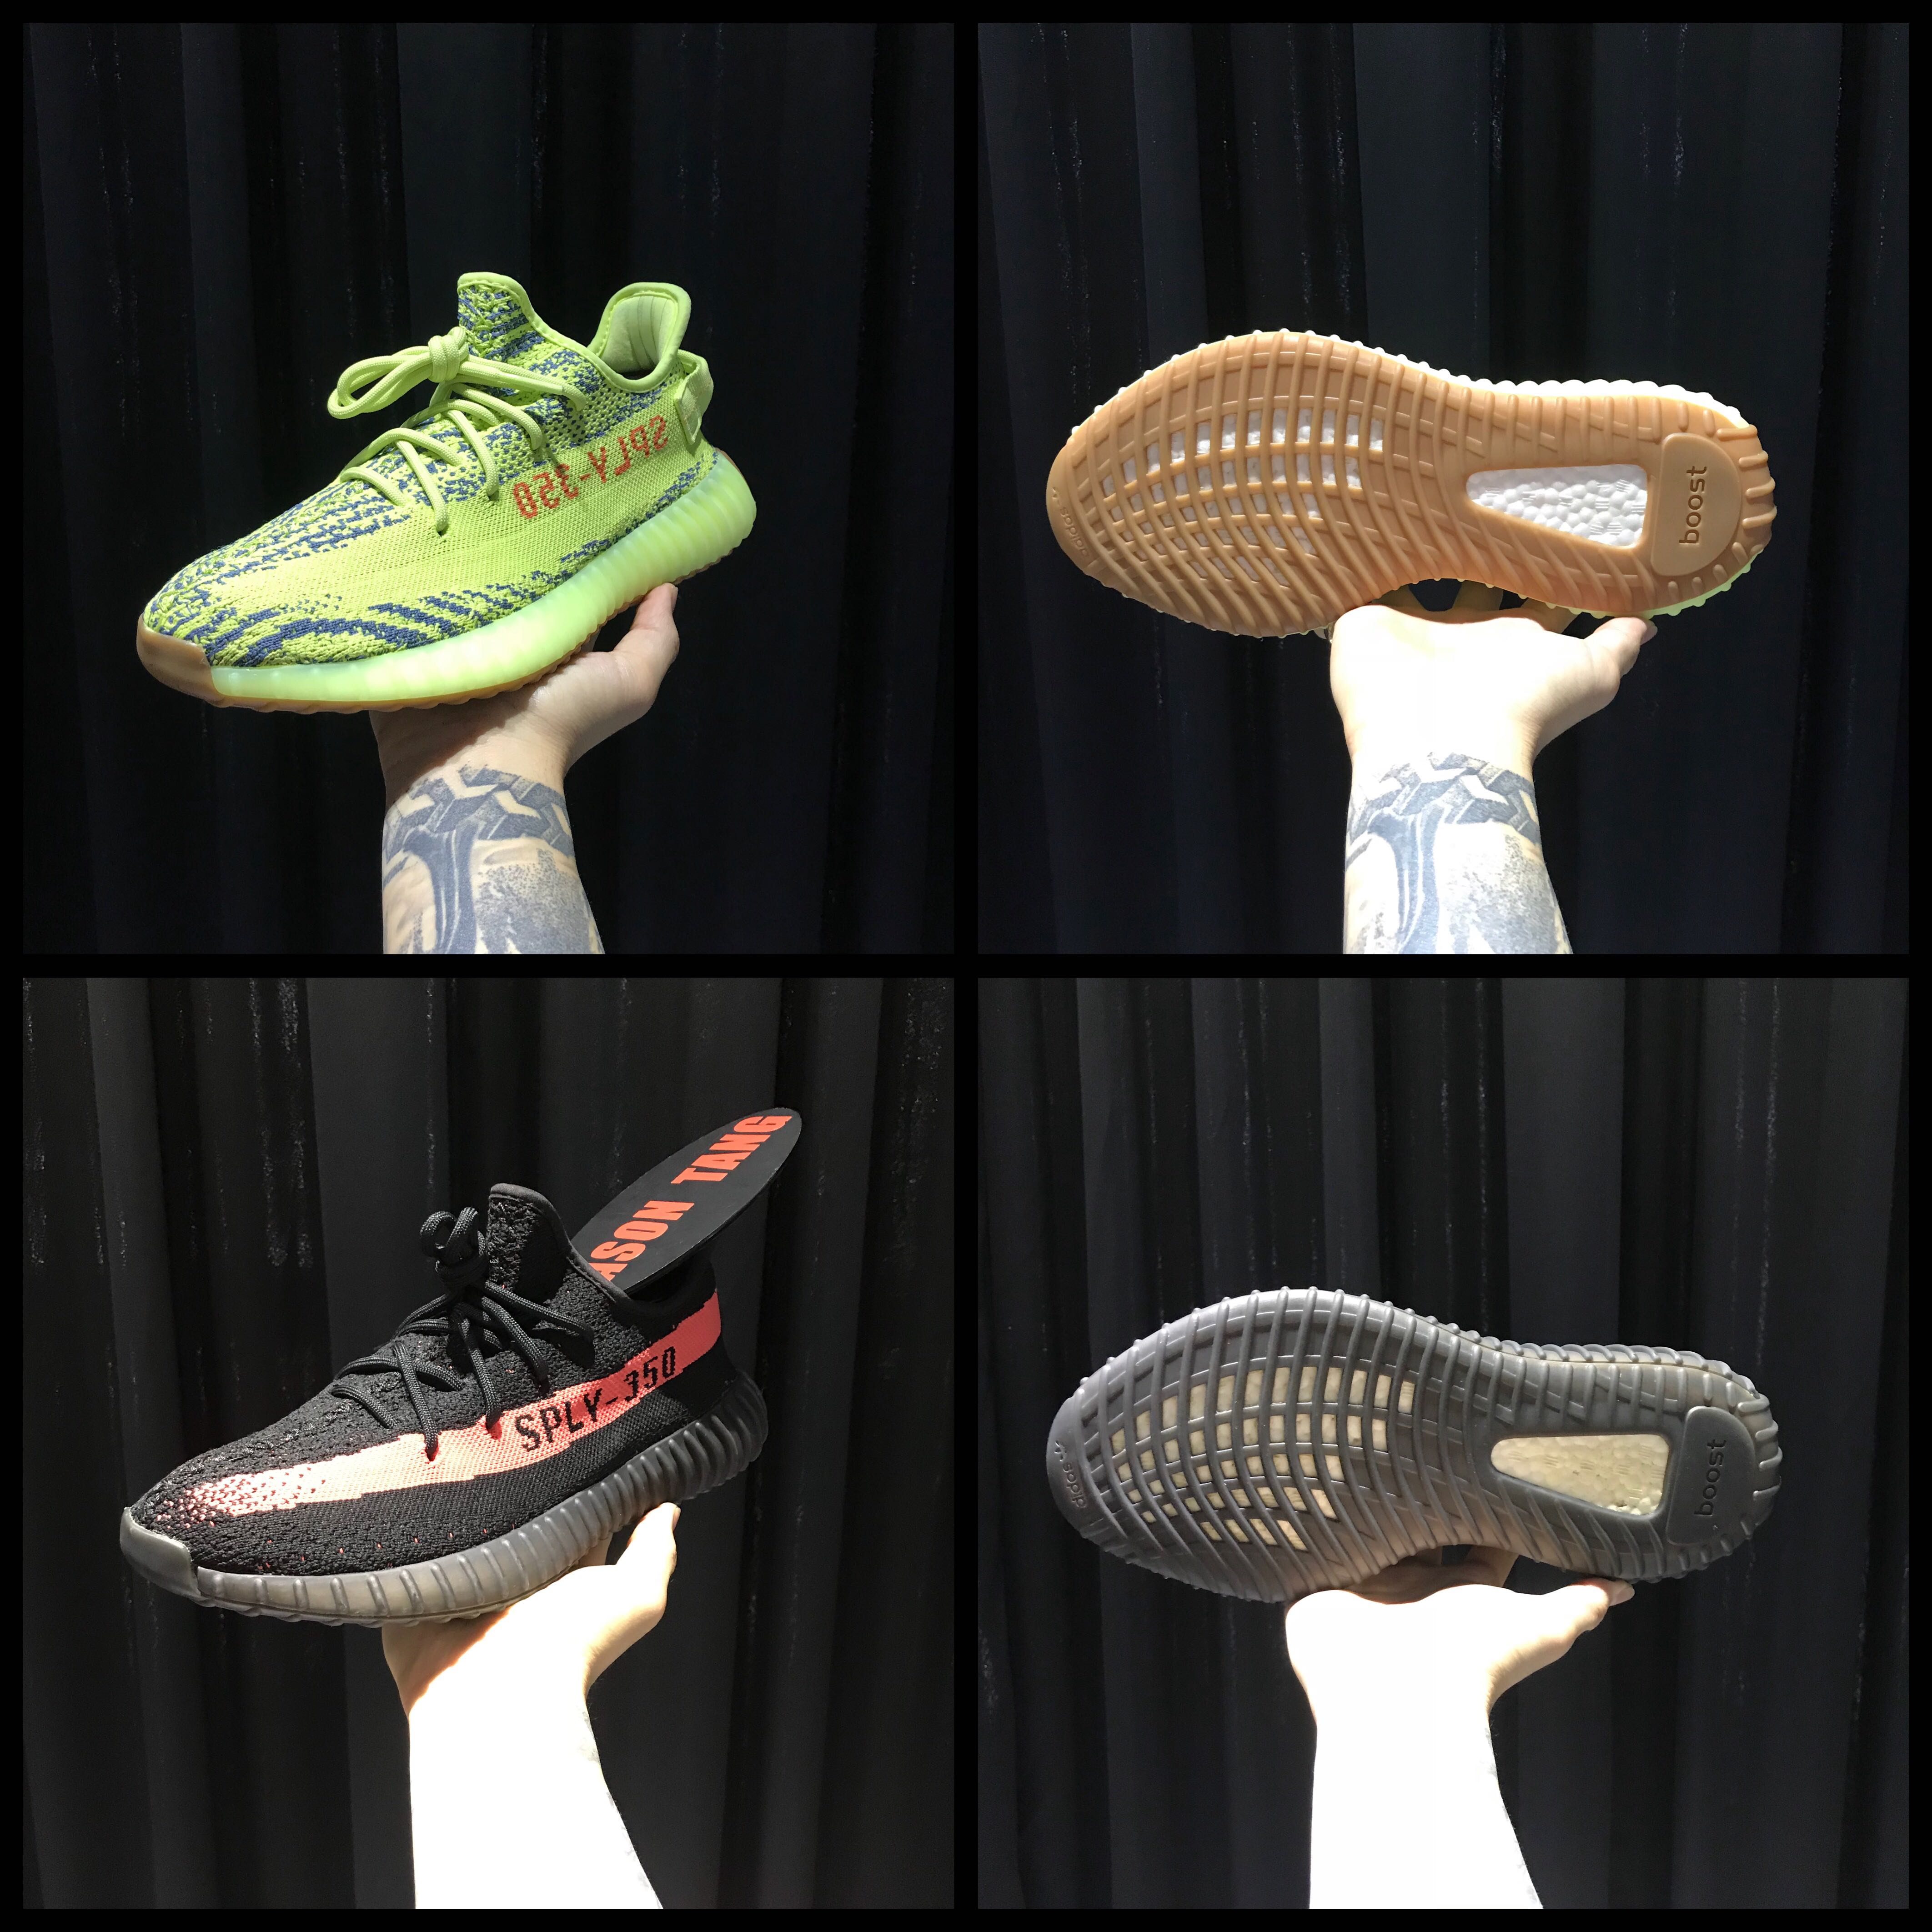 a4d212584b Home · Men s Fashion · Footwear · Sneakers. photo photo photo